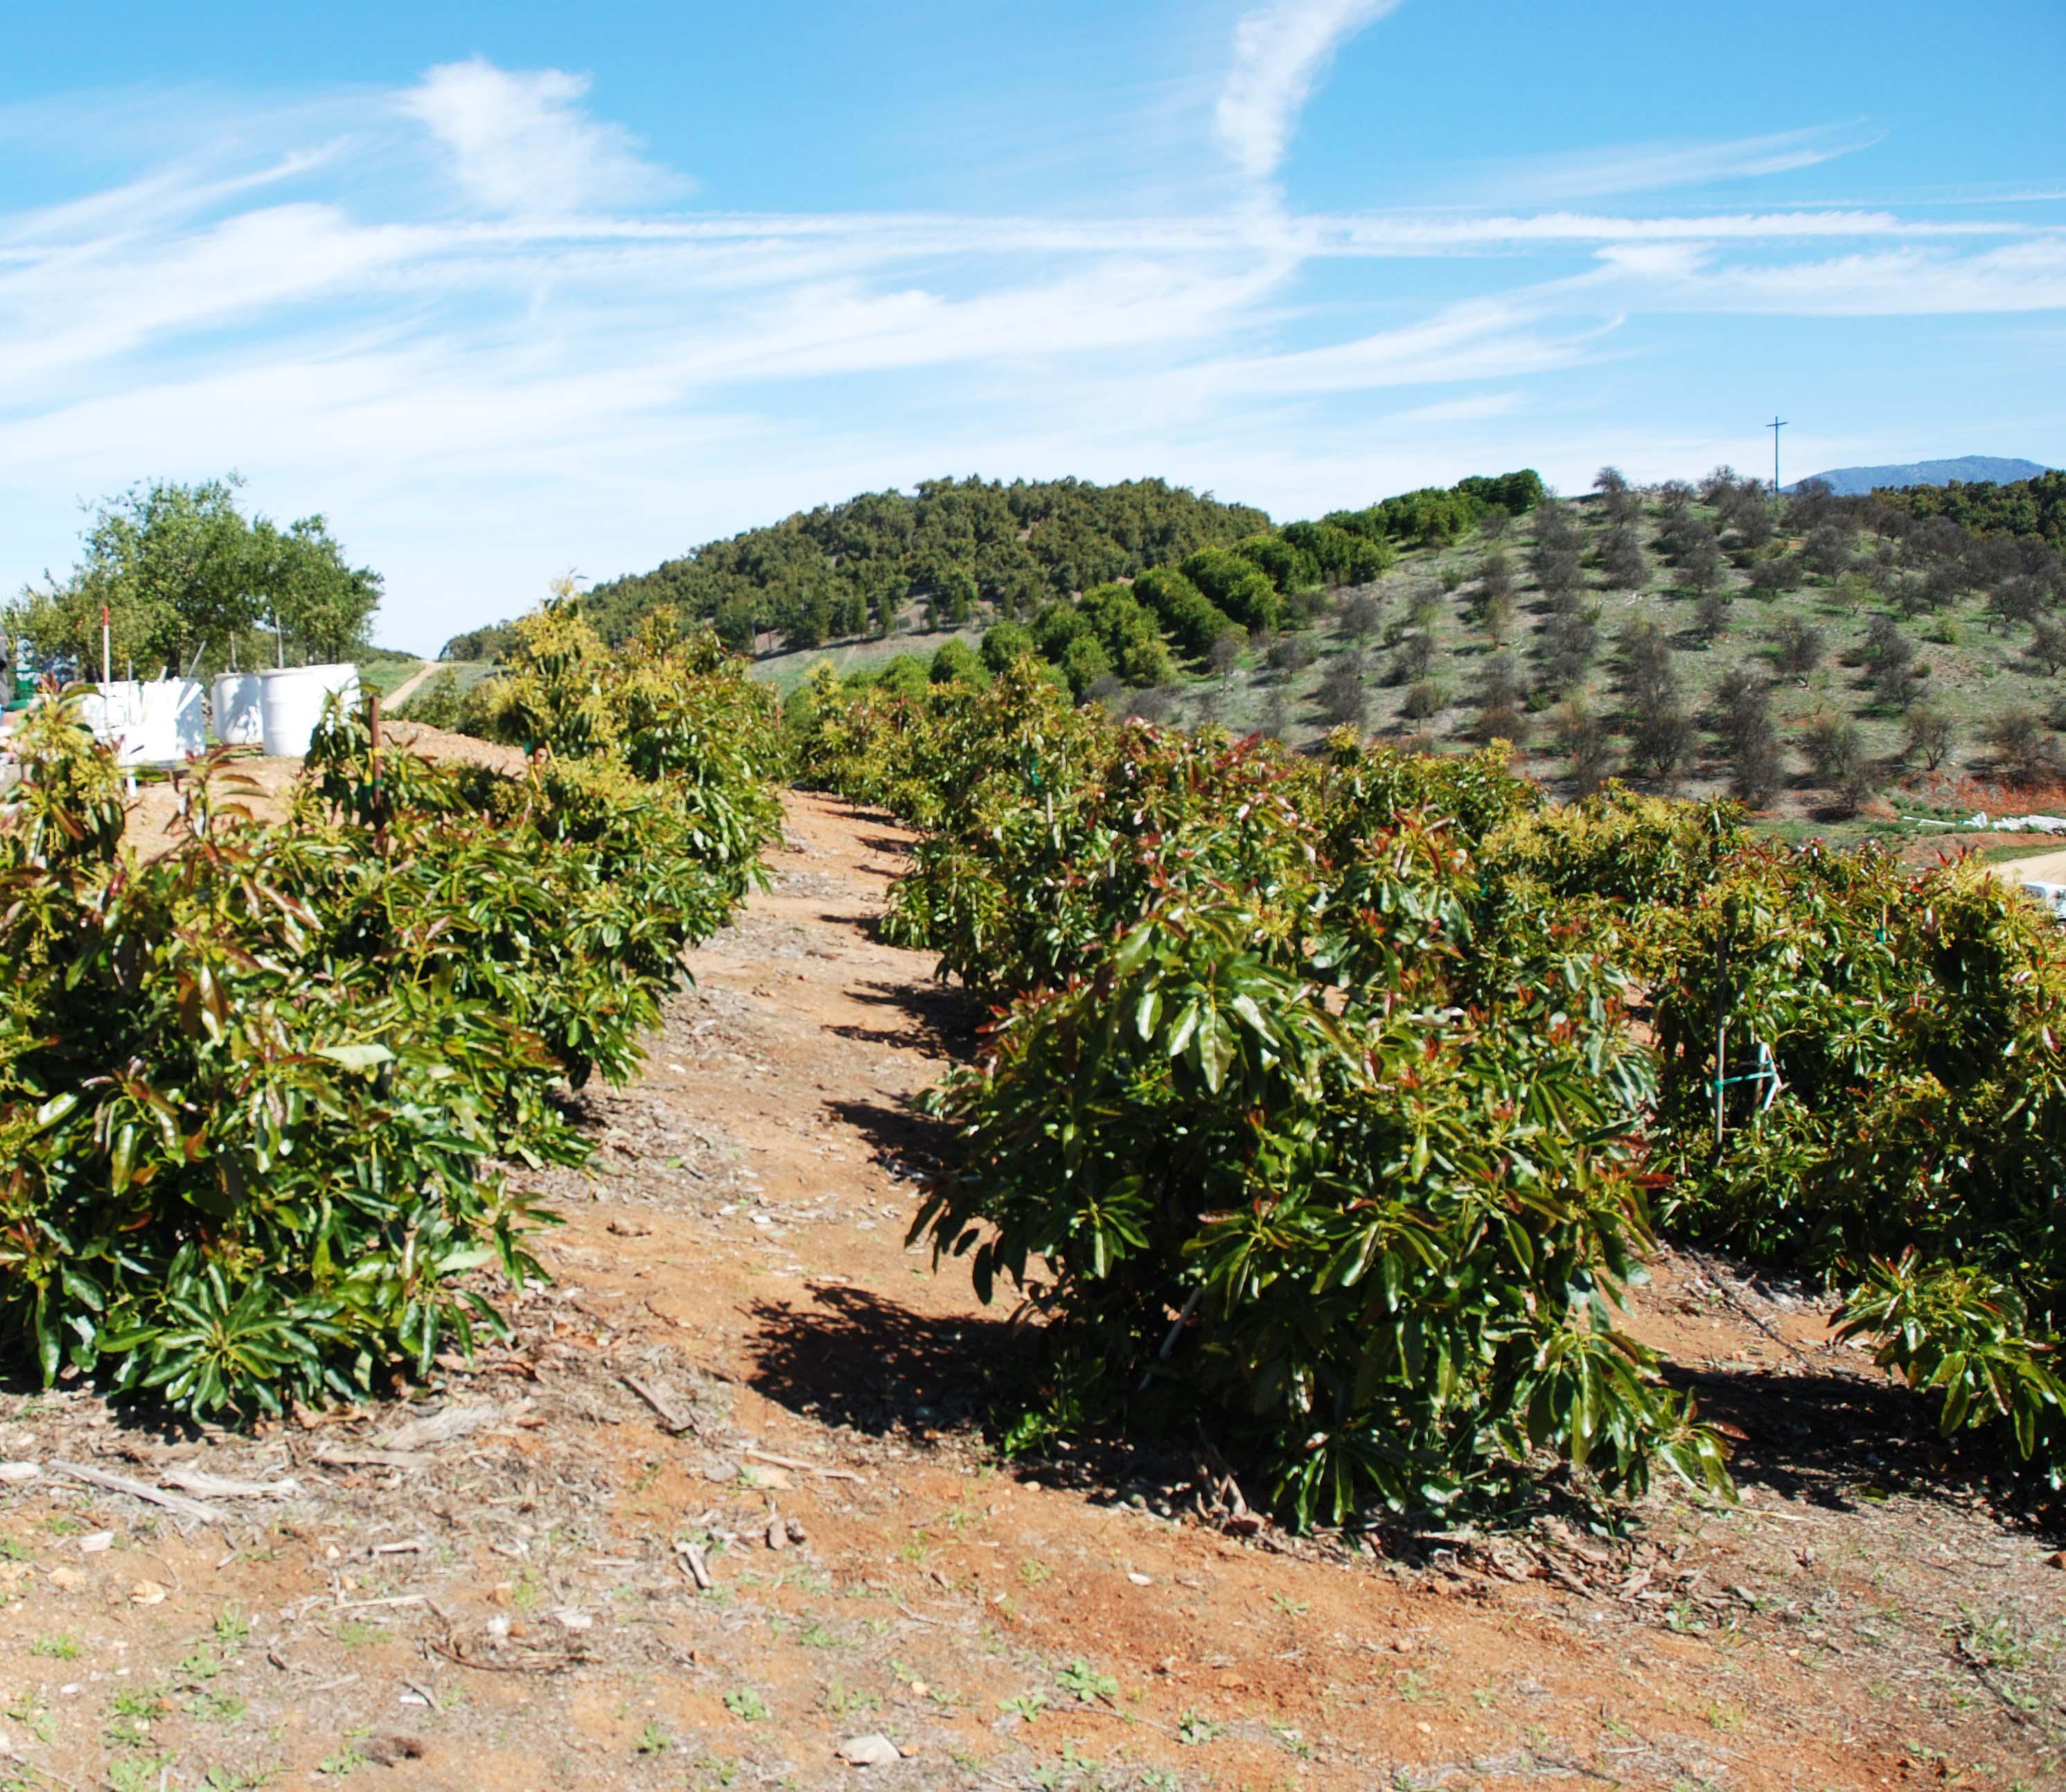 Preparing for the next growers' meeting   California Avocado